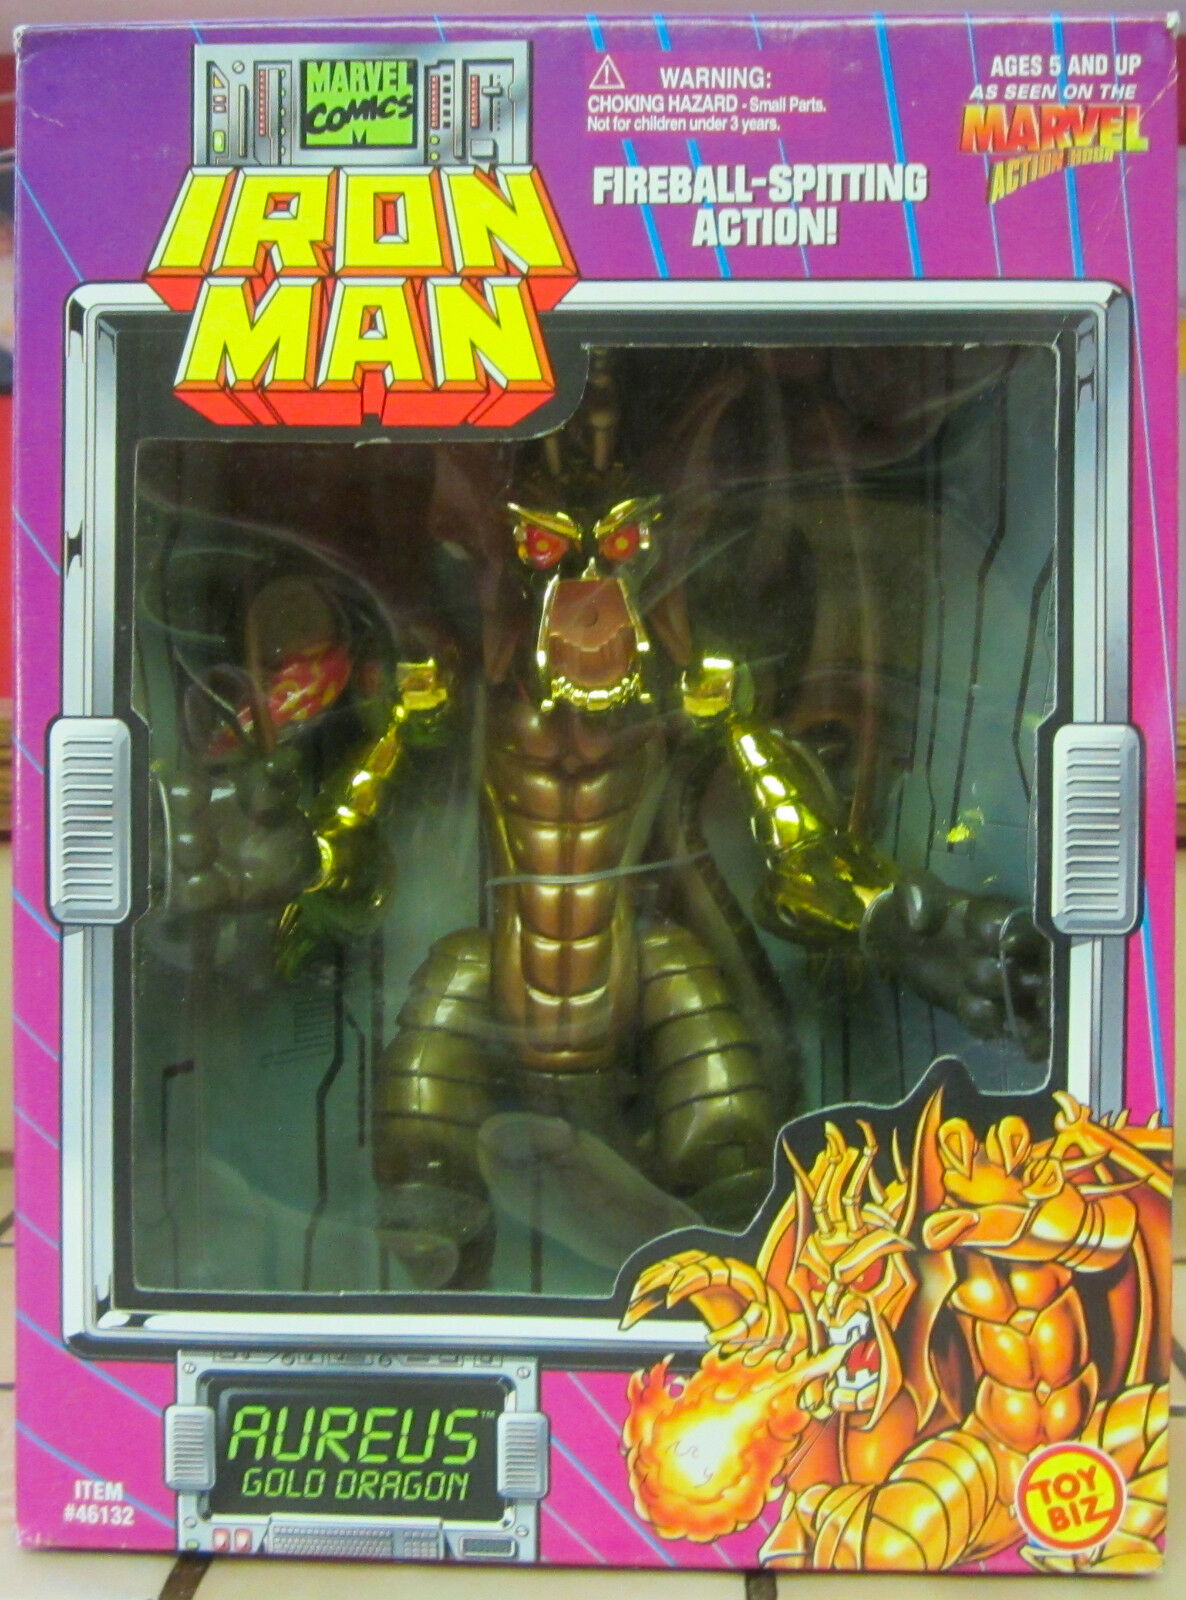 1995 Iron Man Aureus gold Dragon Fireball Spitting Actionigure ToyBiz - NEW